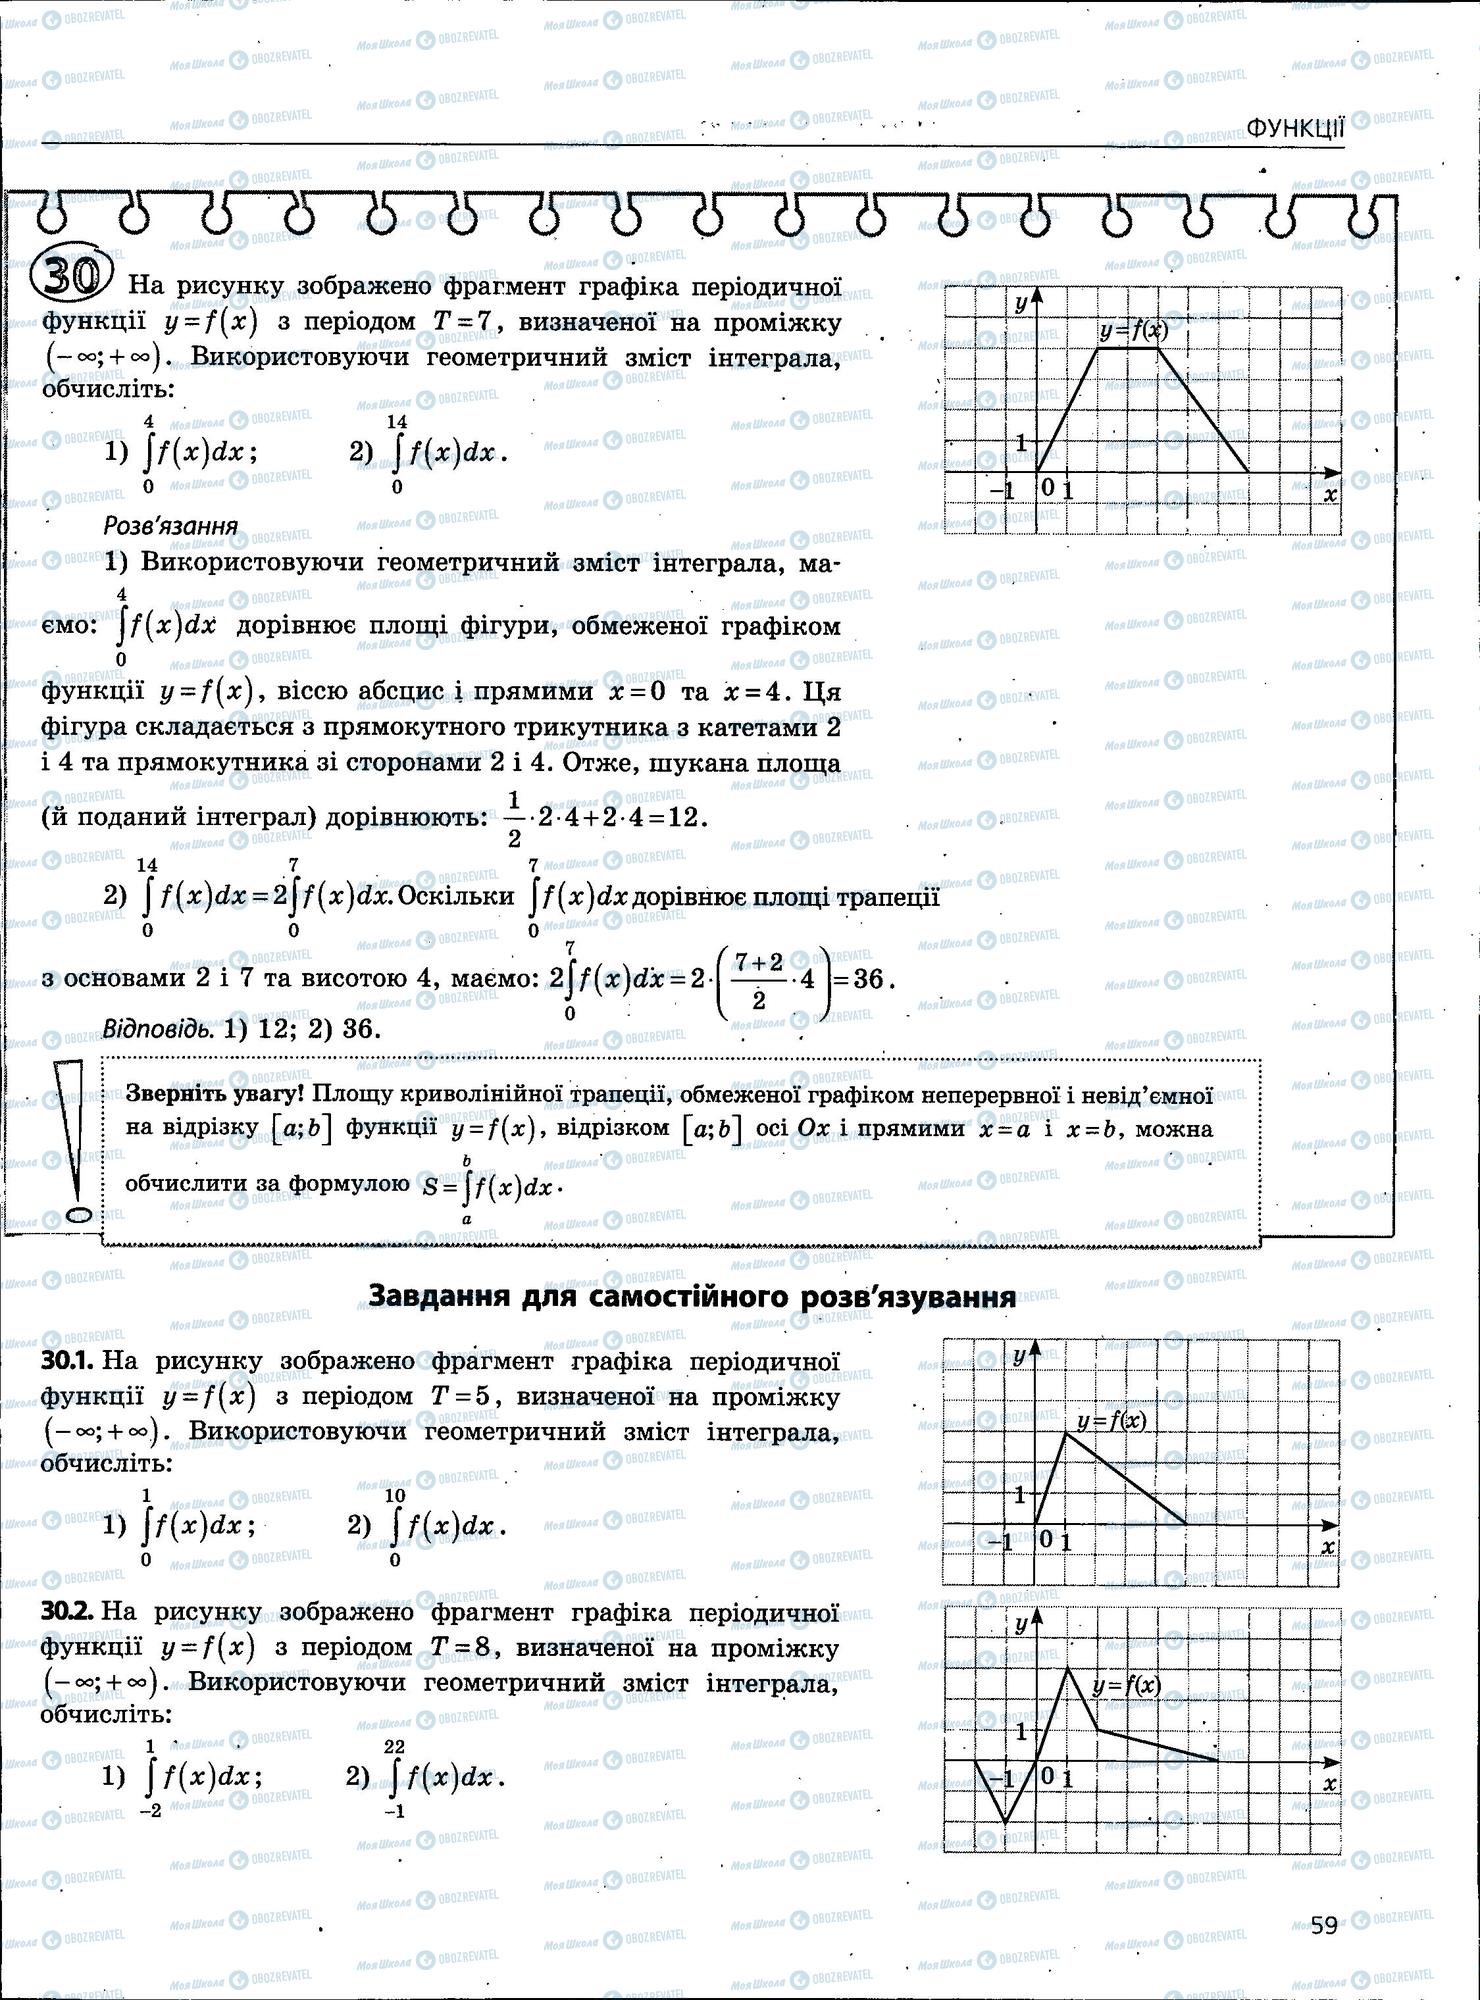 ЗНО Математика 11 класс страница 59